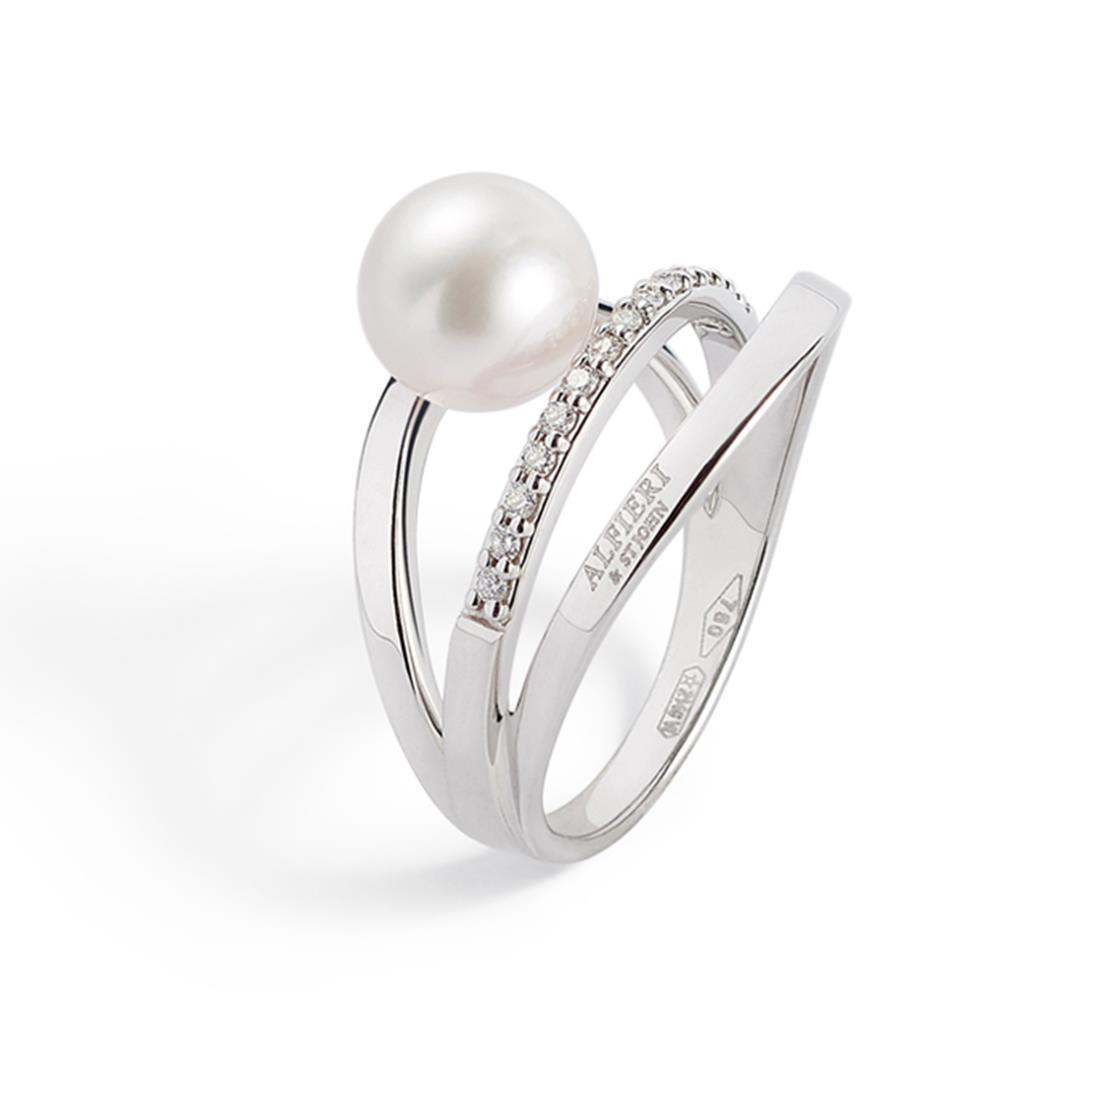 Ring with Akoya pearl and diamonds - ALFIERI & ST. JOHN